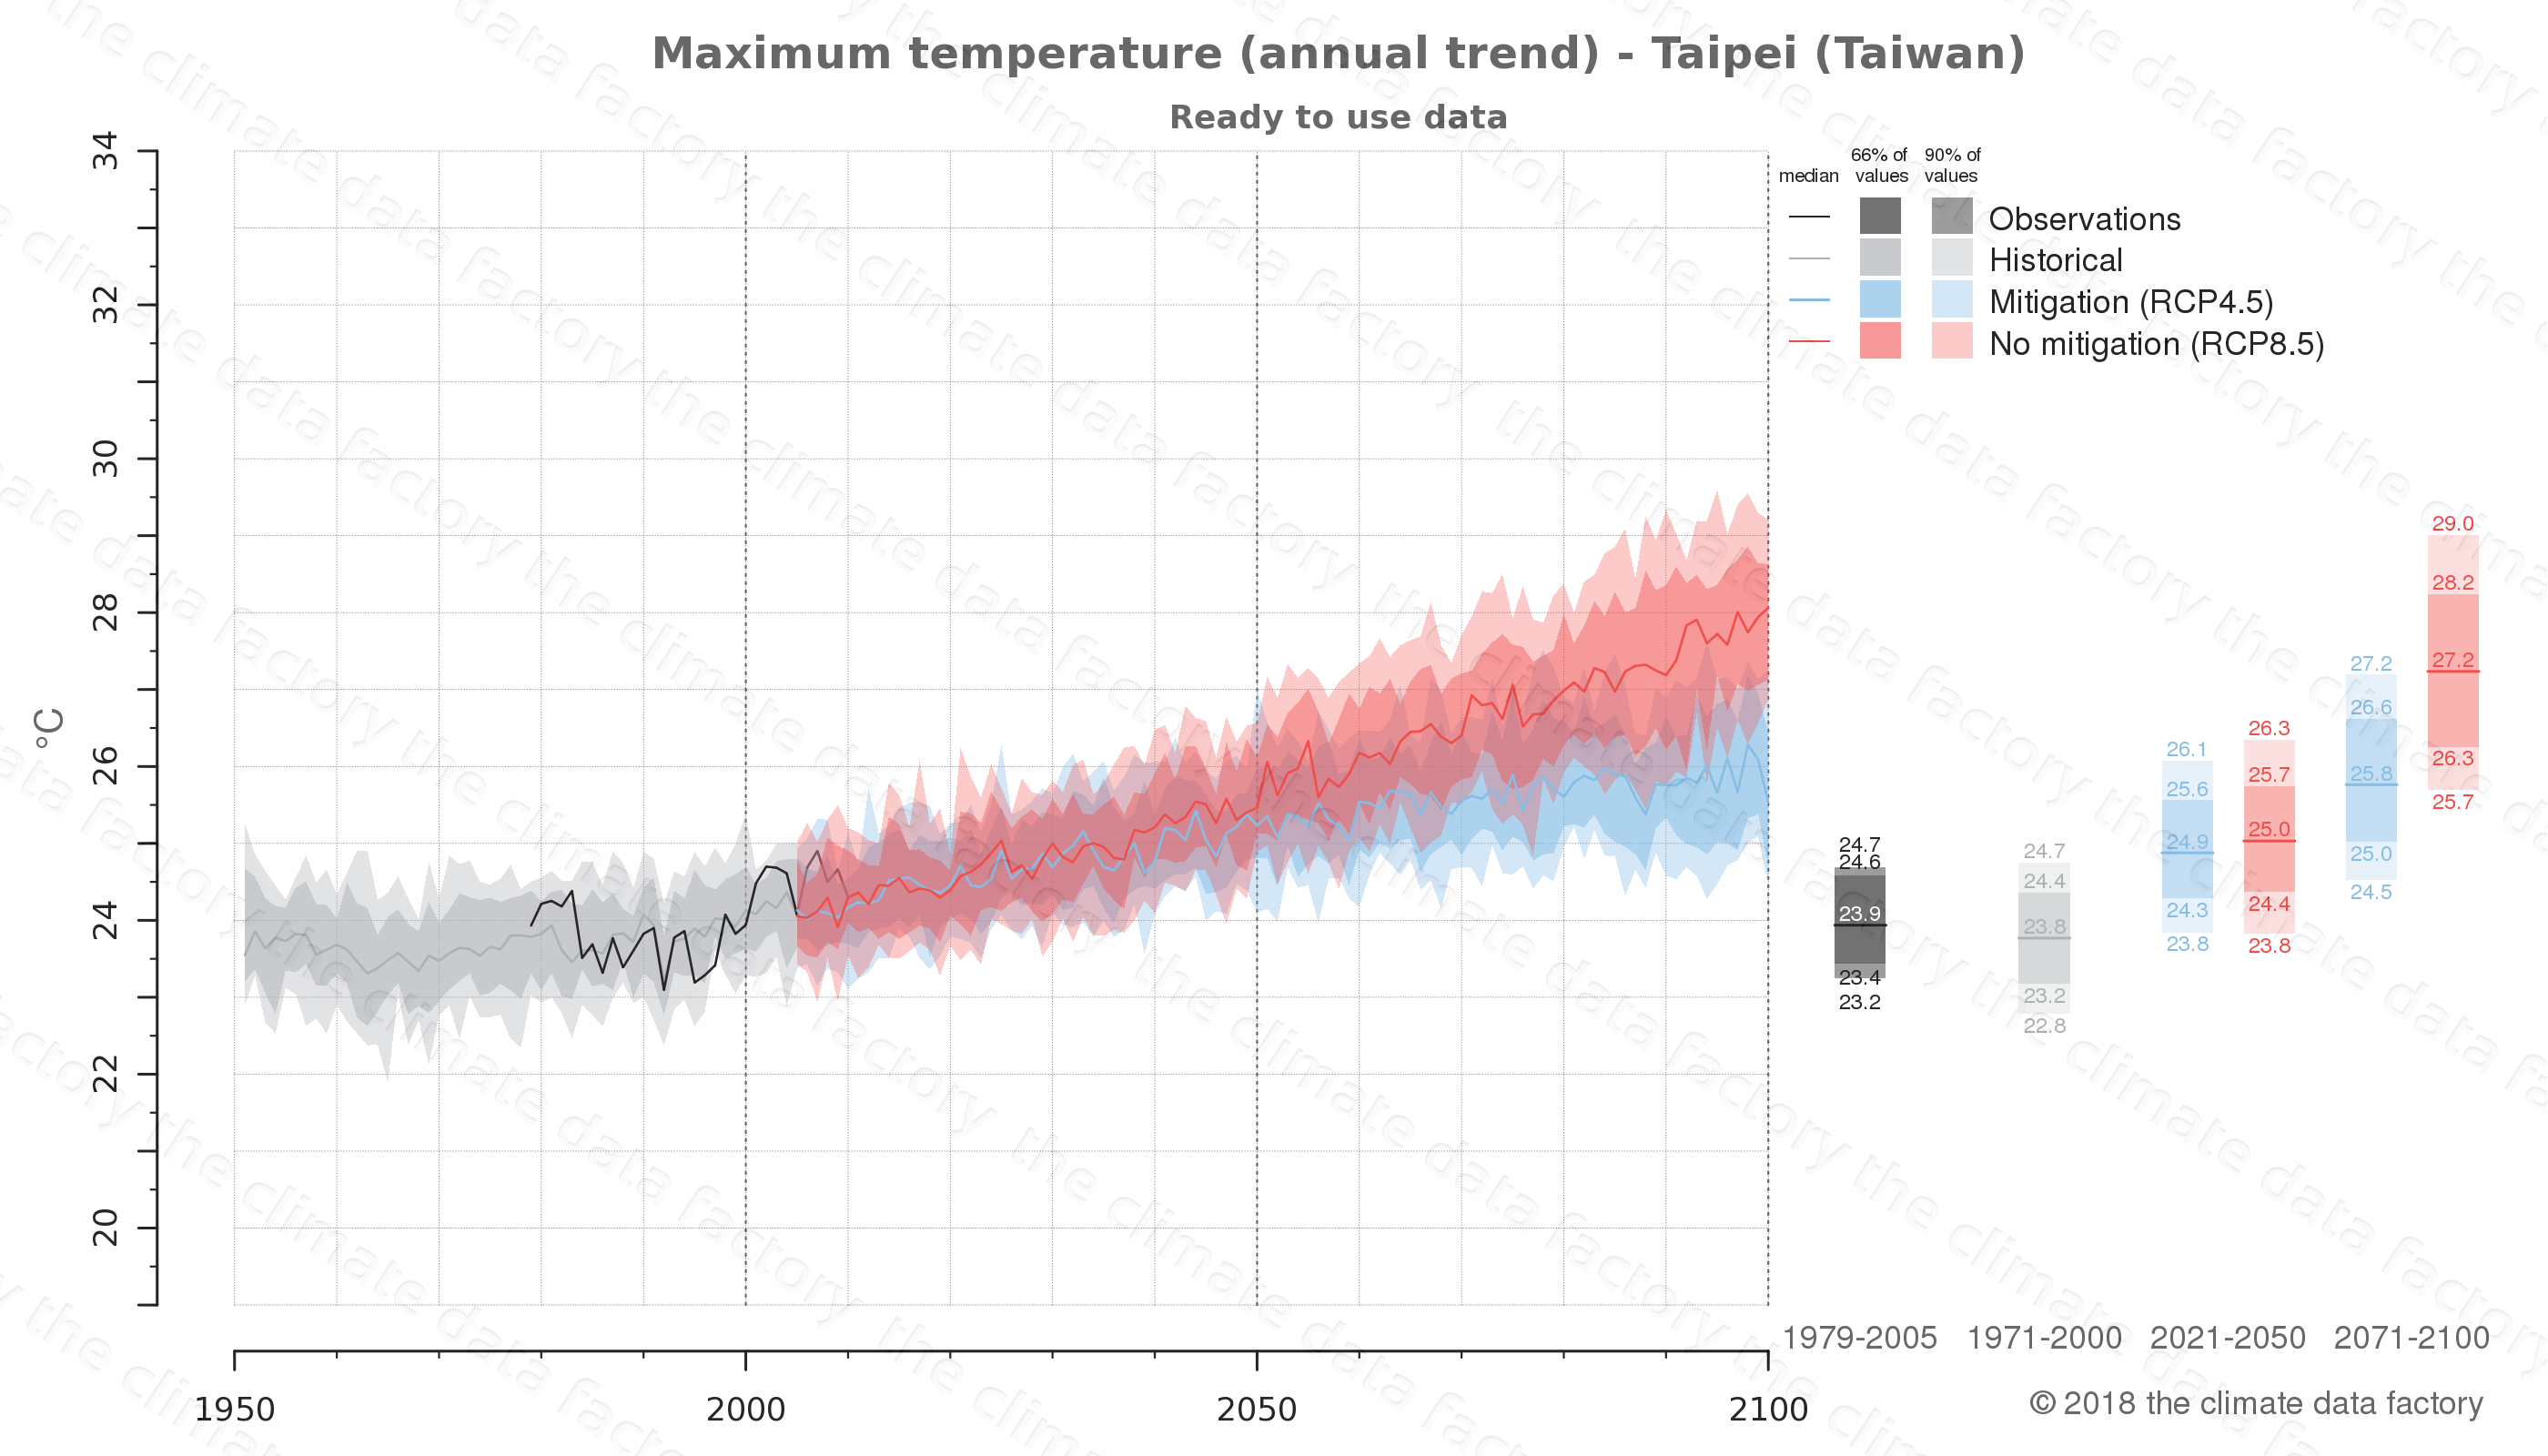 climate change data policy adaptation climate graph city data maximum-temperature taipei taiwan